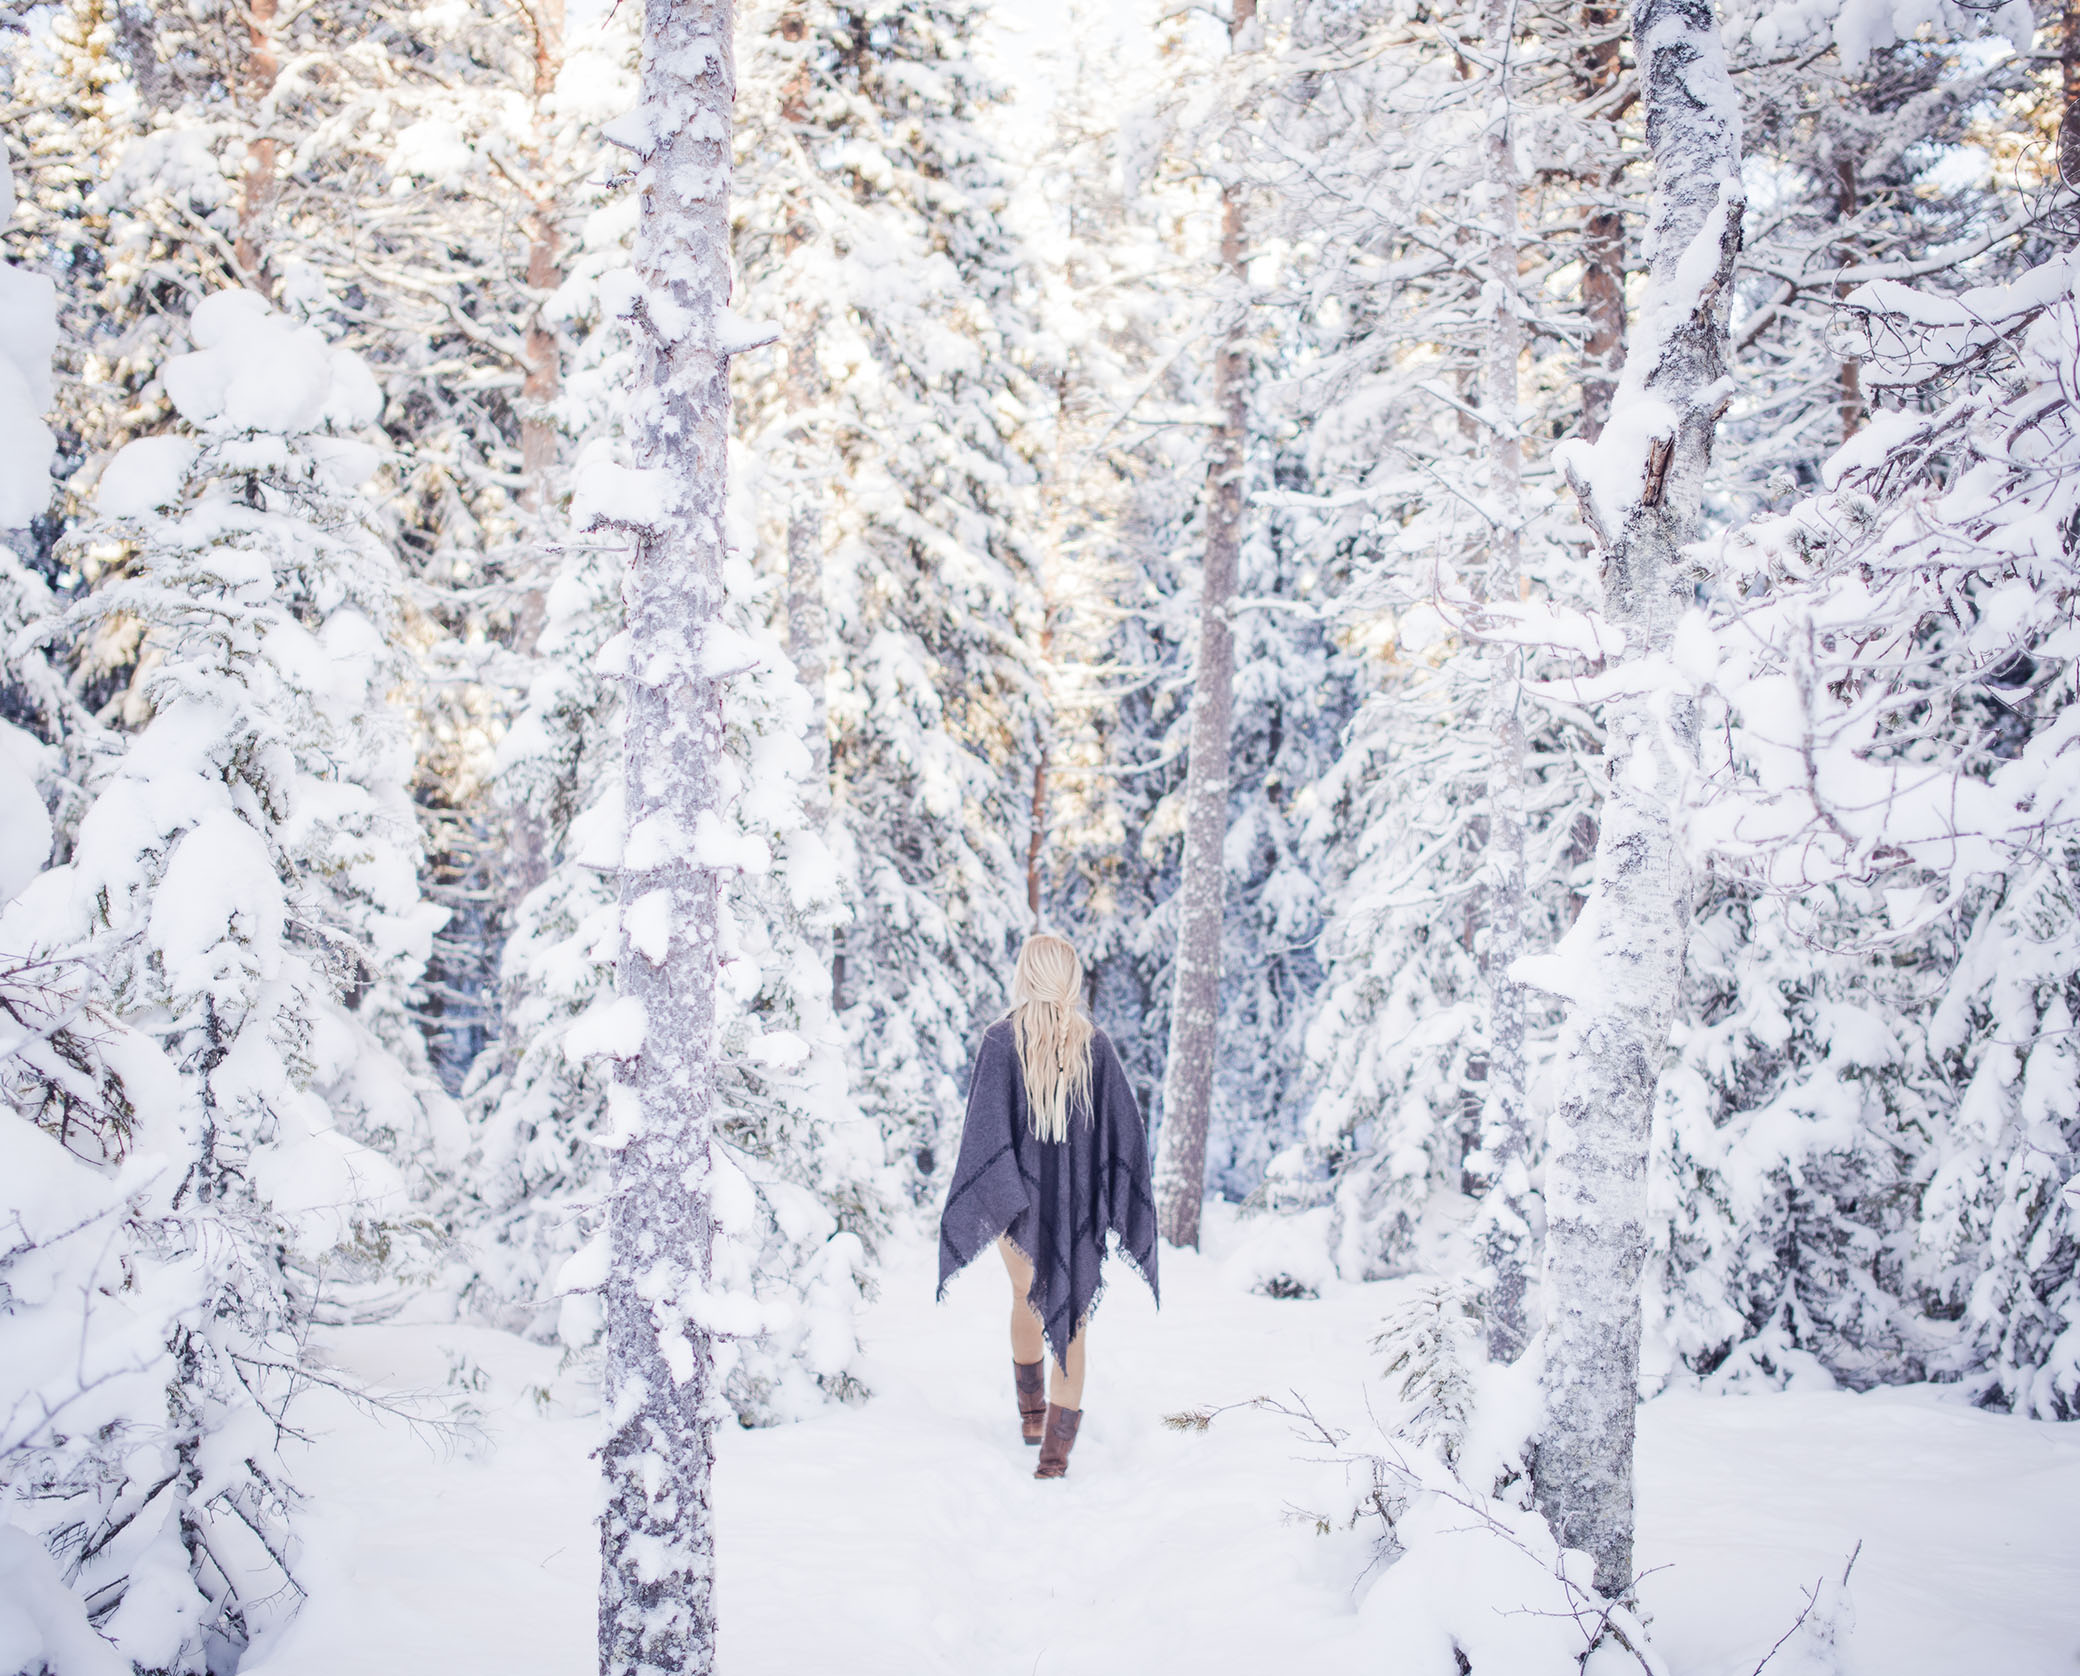 jonna jinton - vinterskog